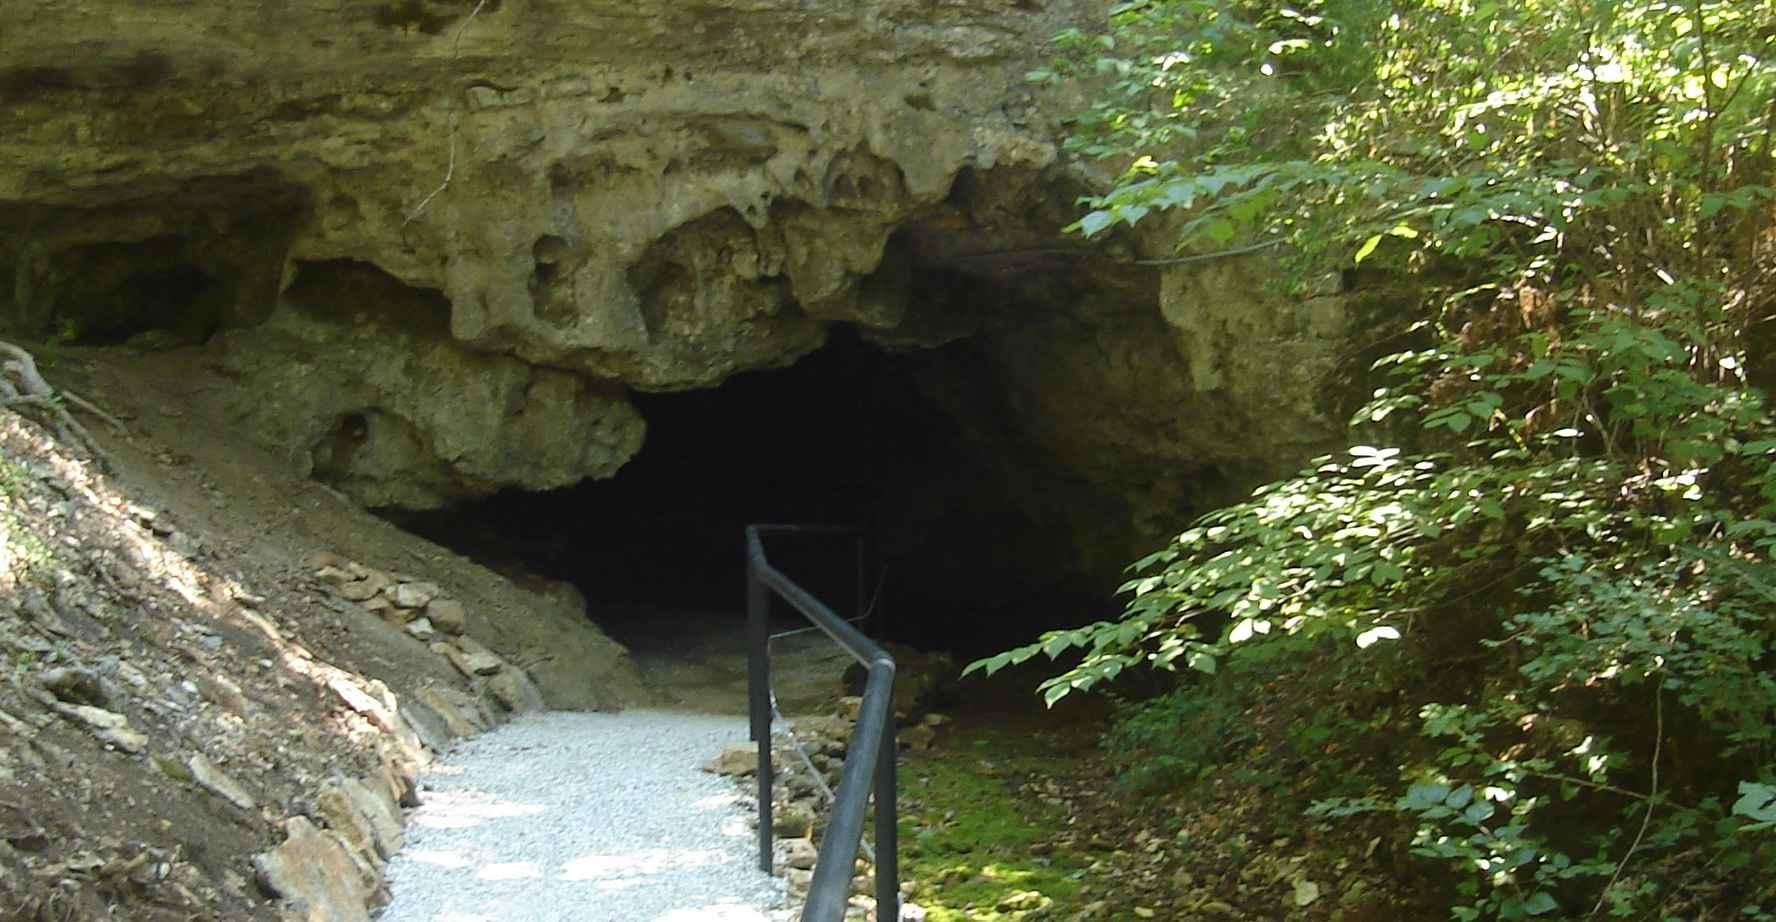 Smallin Cave Fielding Cave